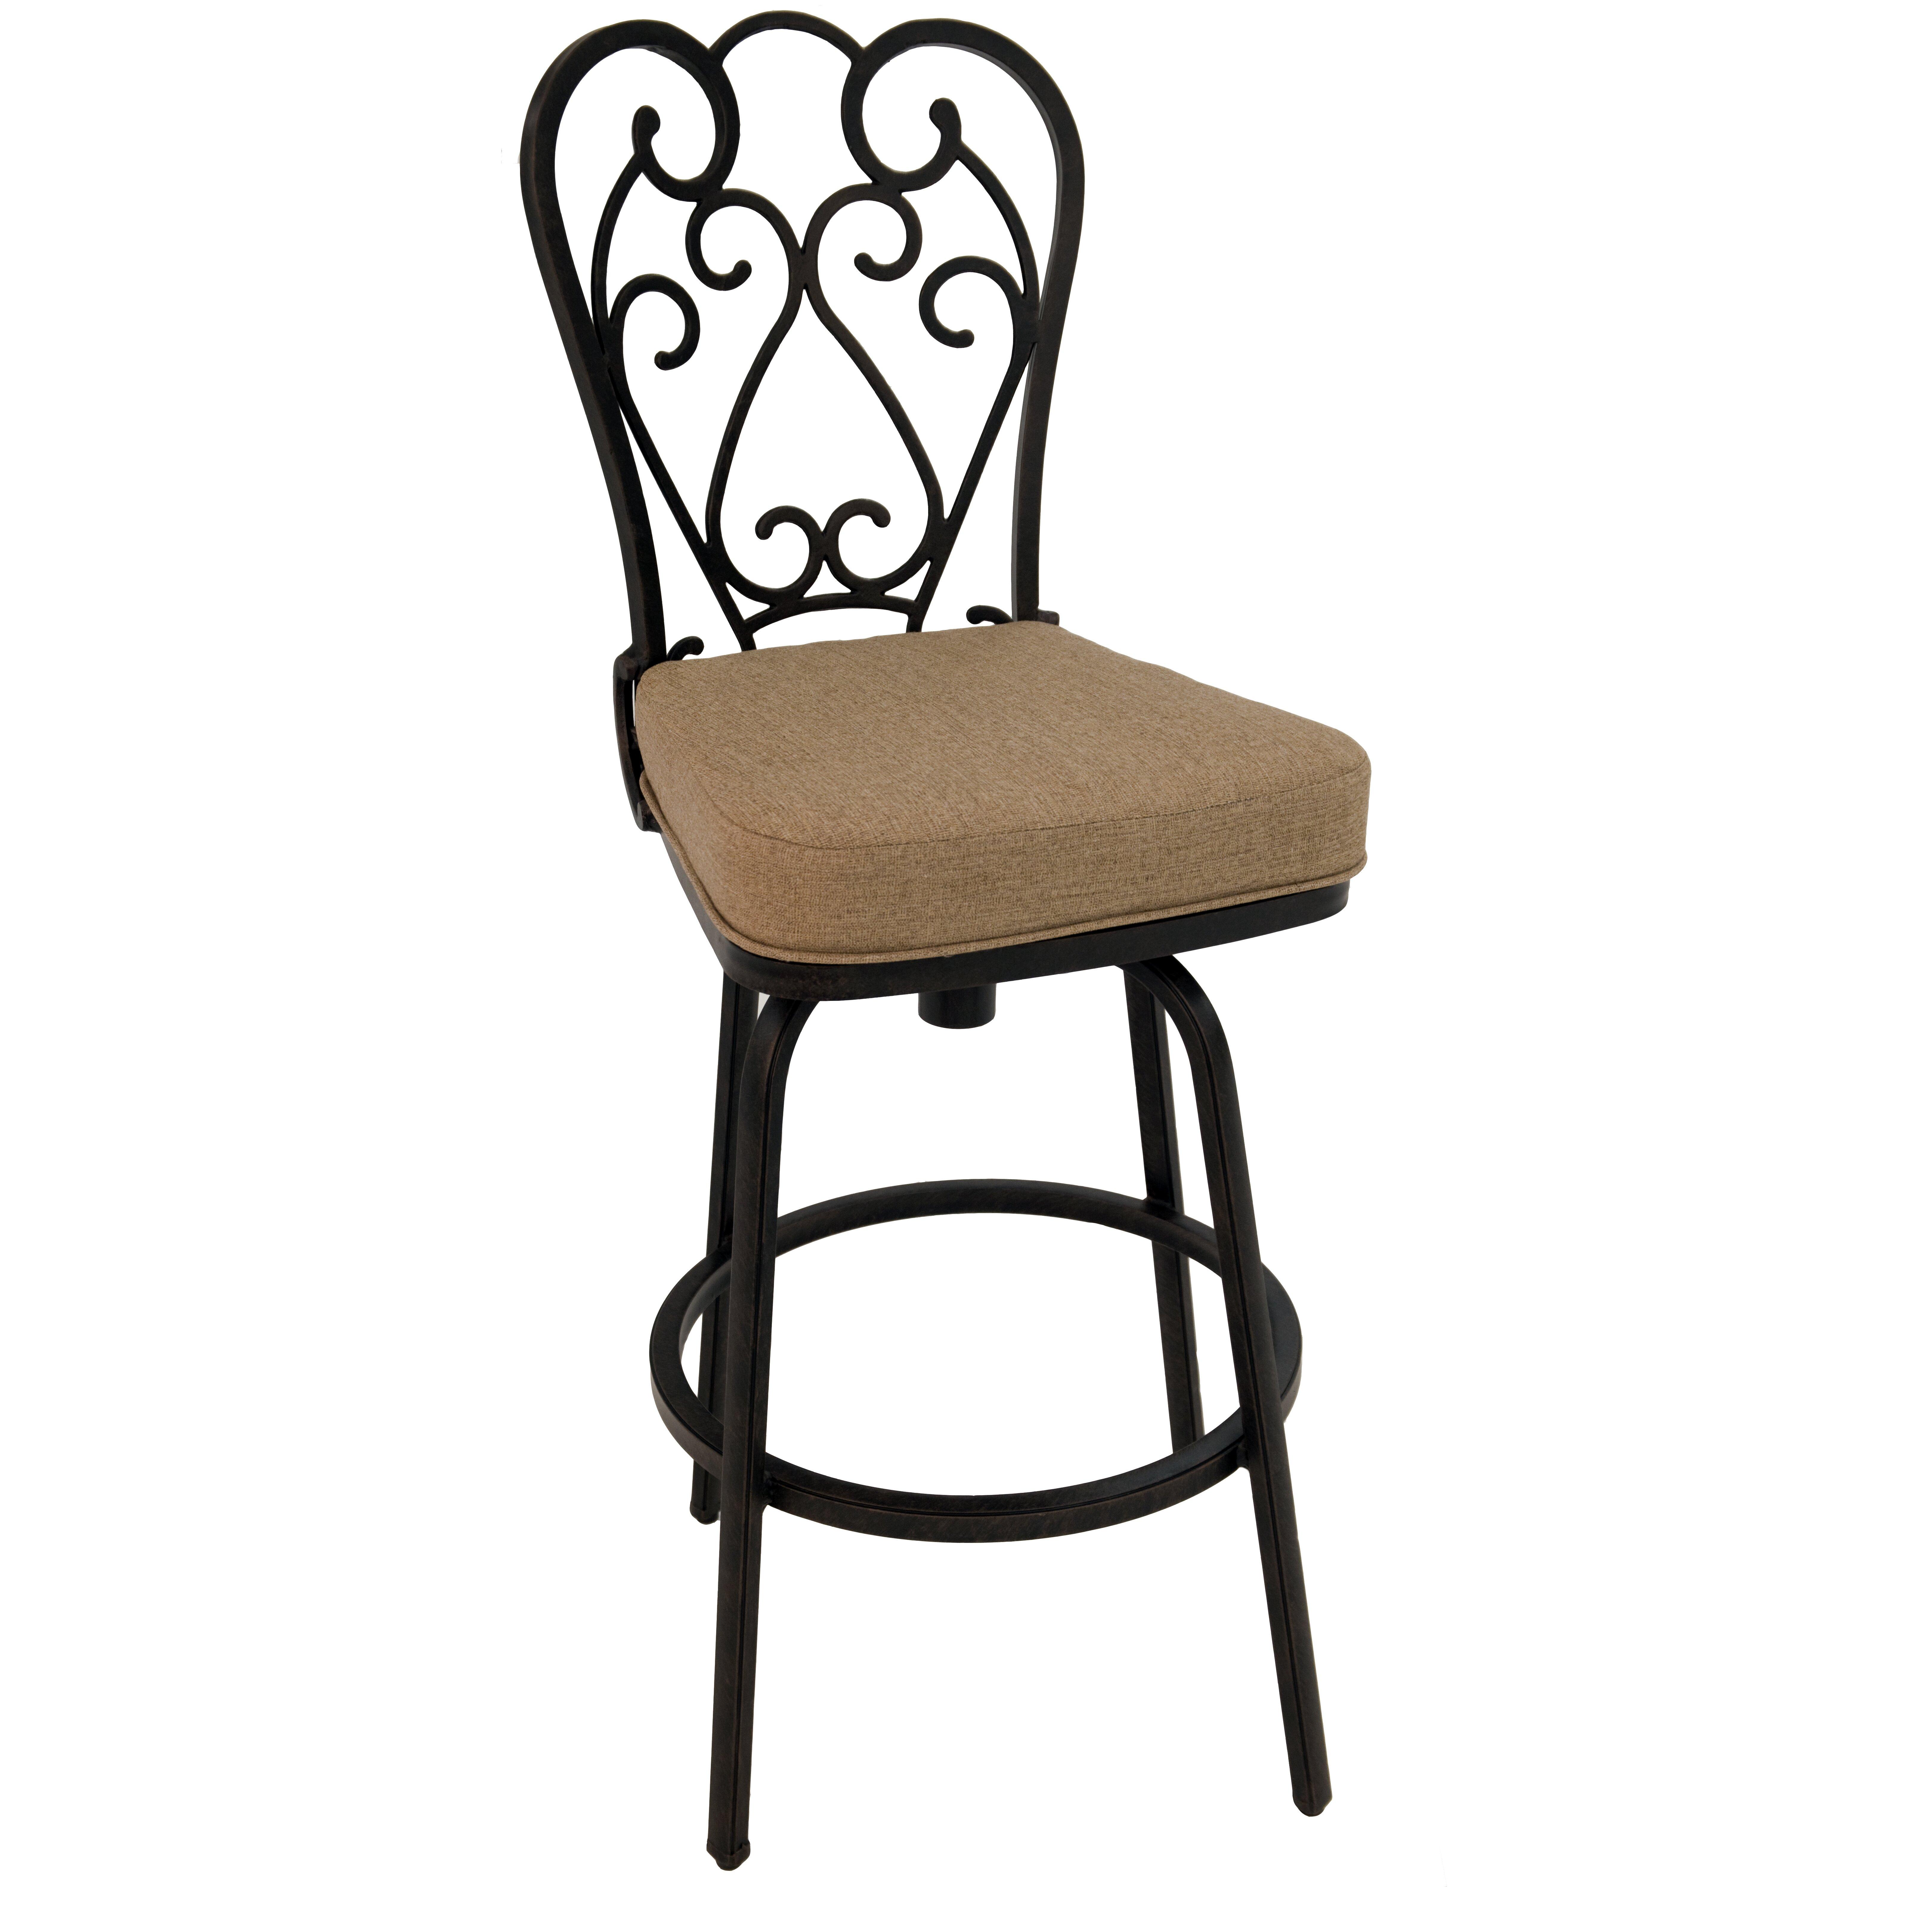 Impacterra magnolia 30quot bar stool with cushion wayfair for Magnolia home furniture bar stools